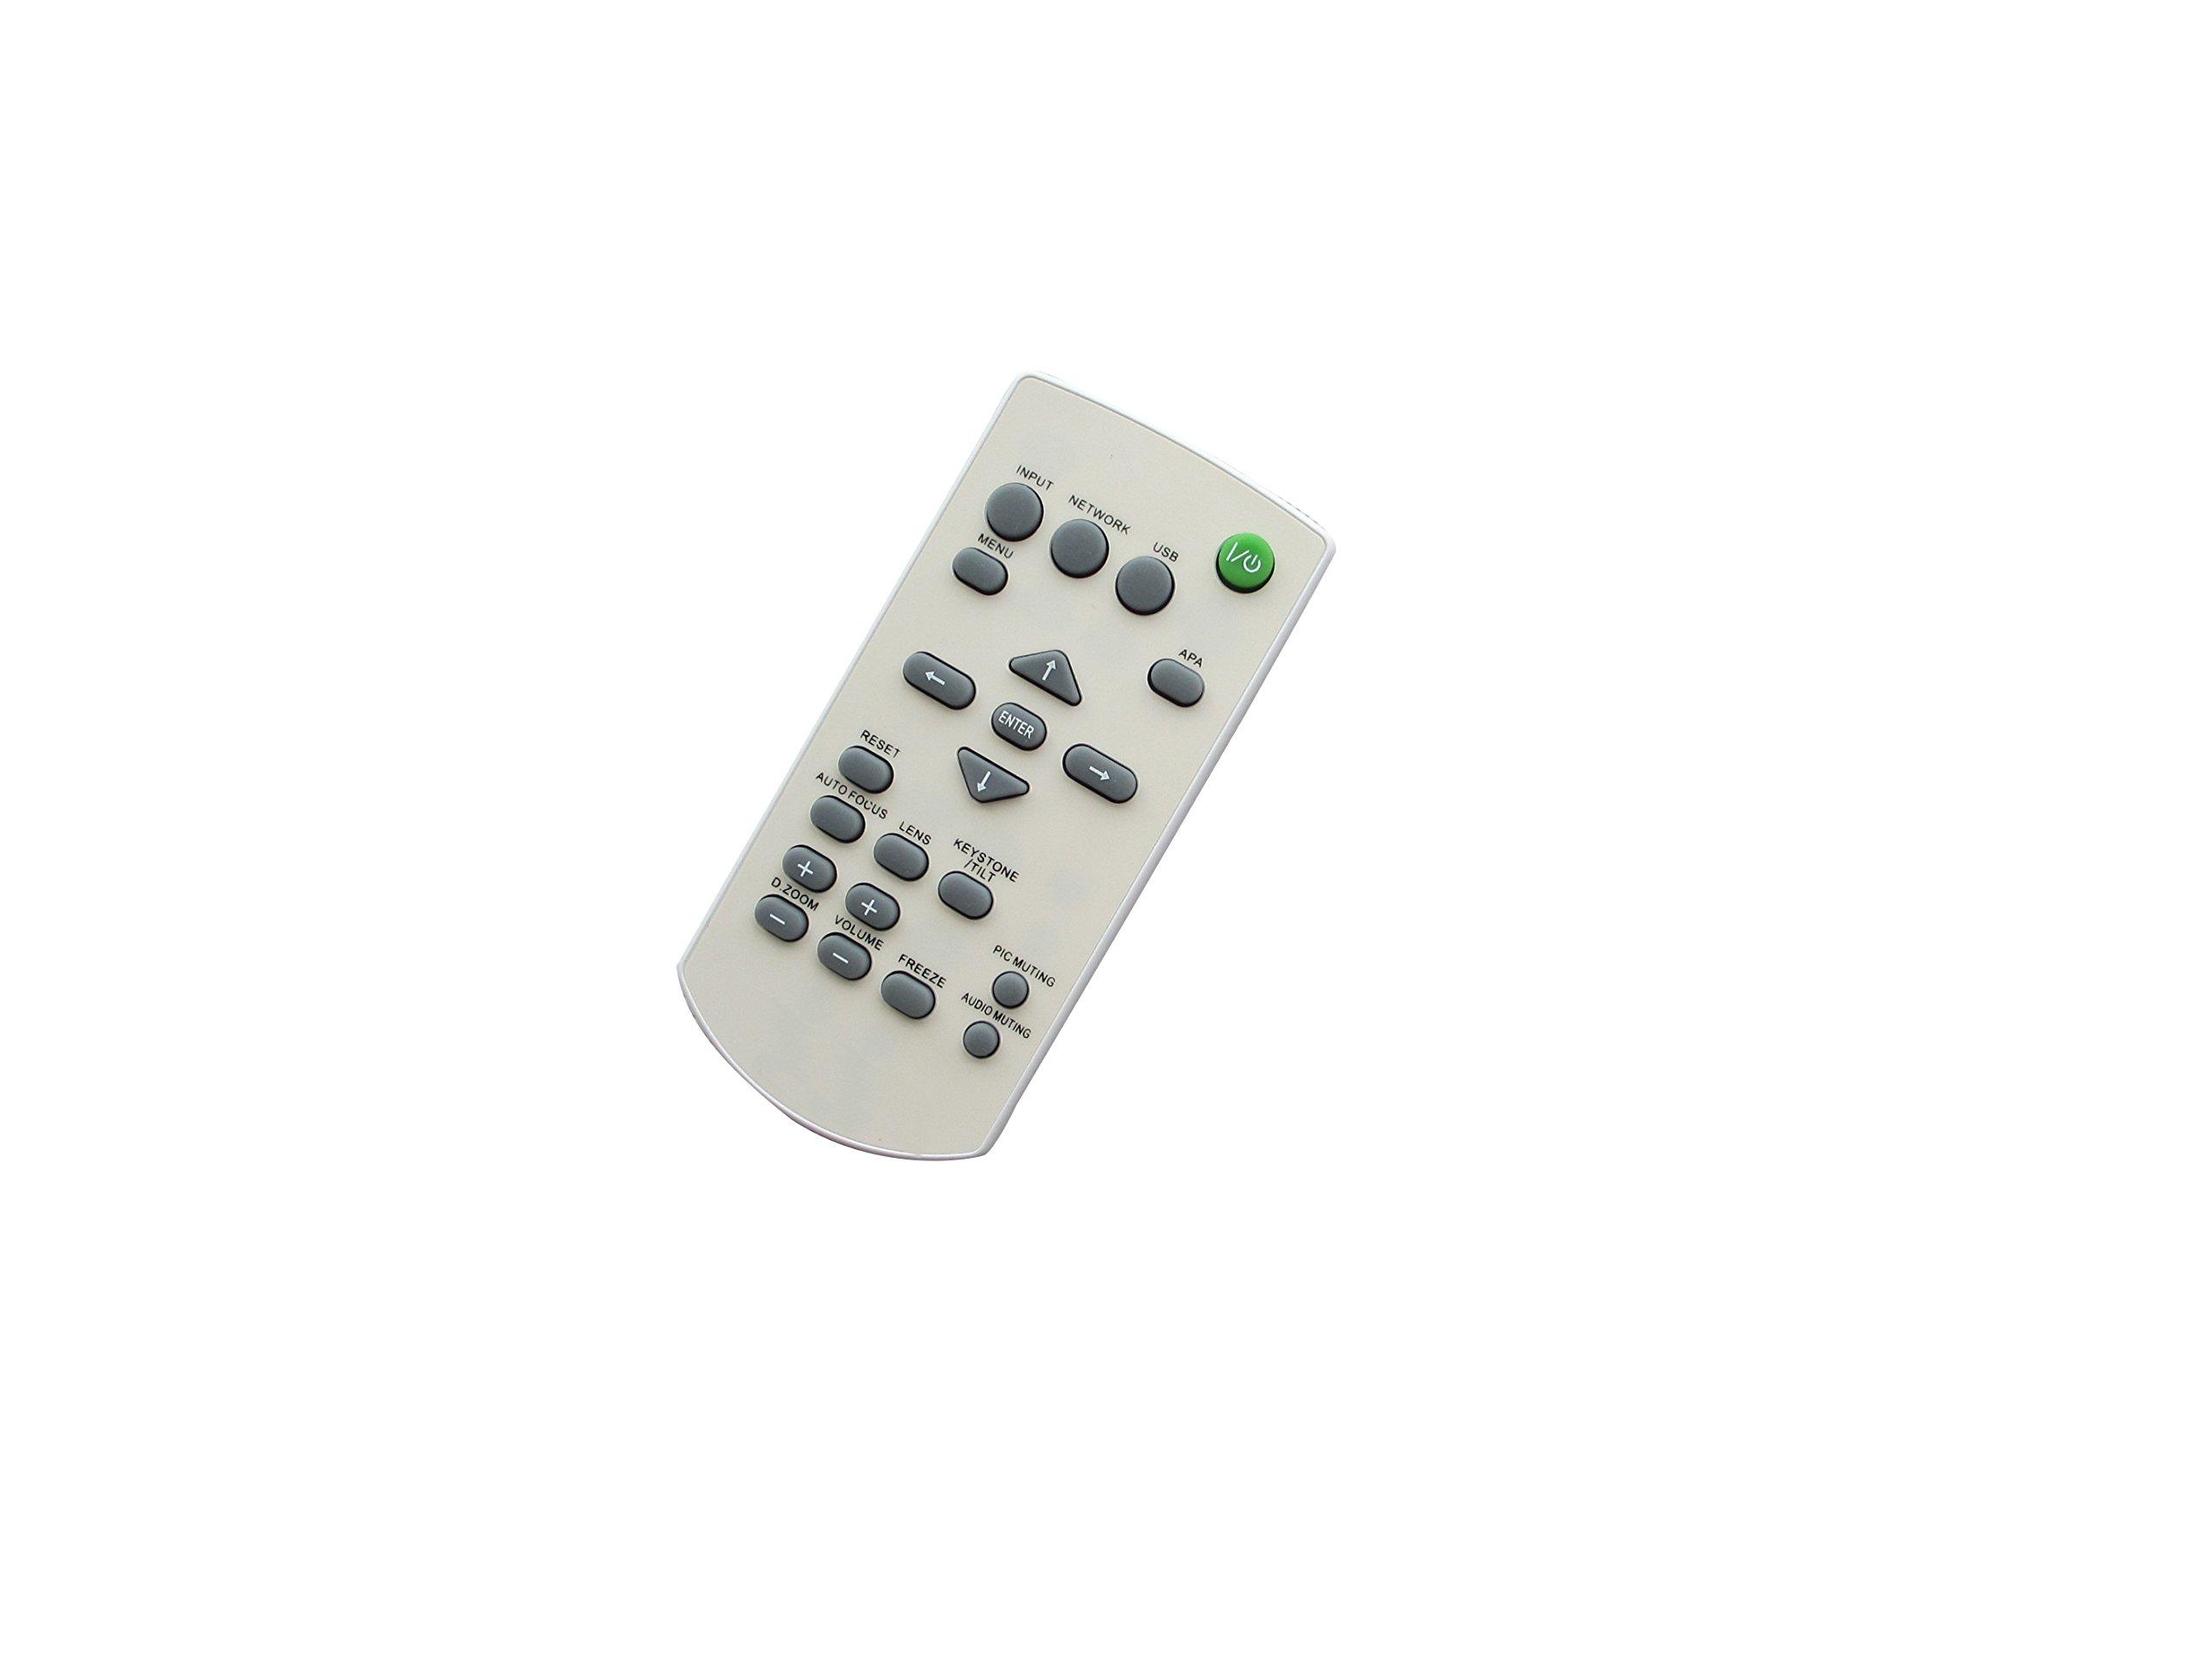 HCDZ Universal Replacement Remote Control Fit For Sony RM-PJ18 VPL-PWZ10 VPL-PX35 VPL-VW10HT VPL-HW10 3LCD Projector